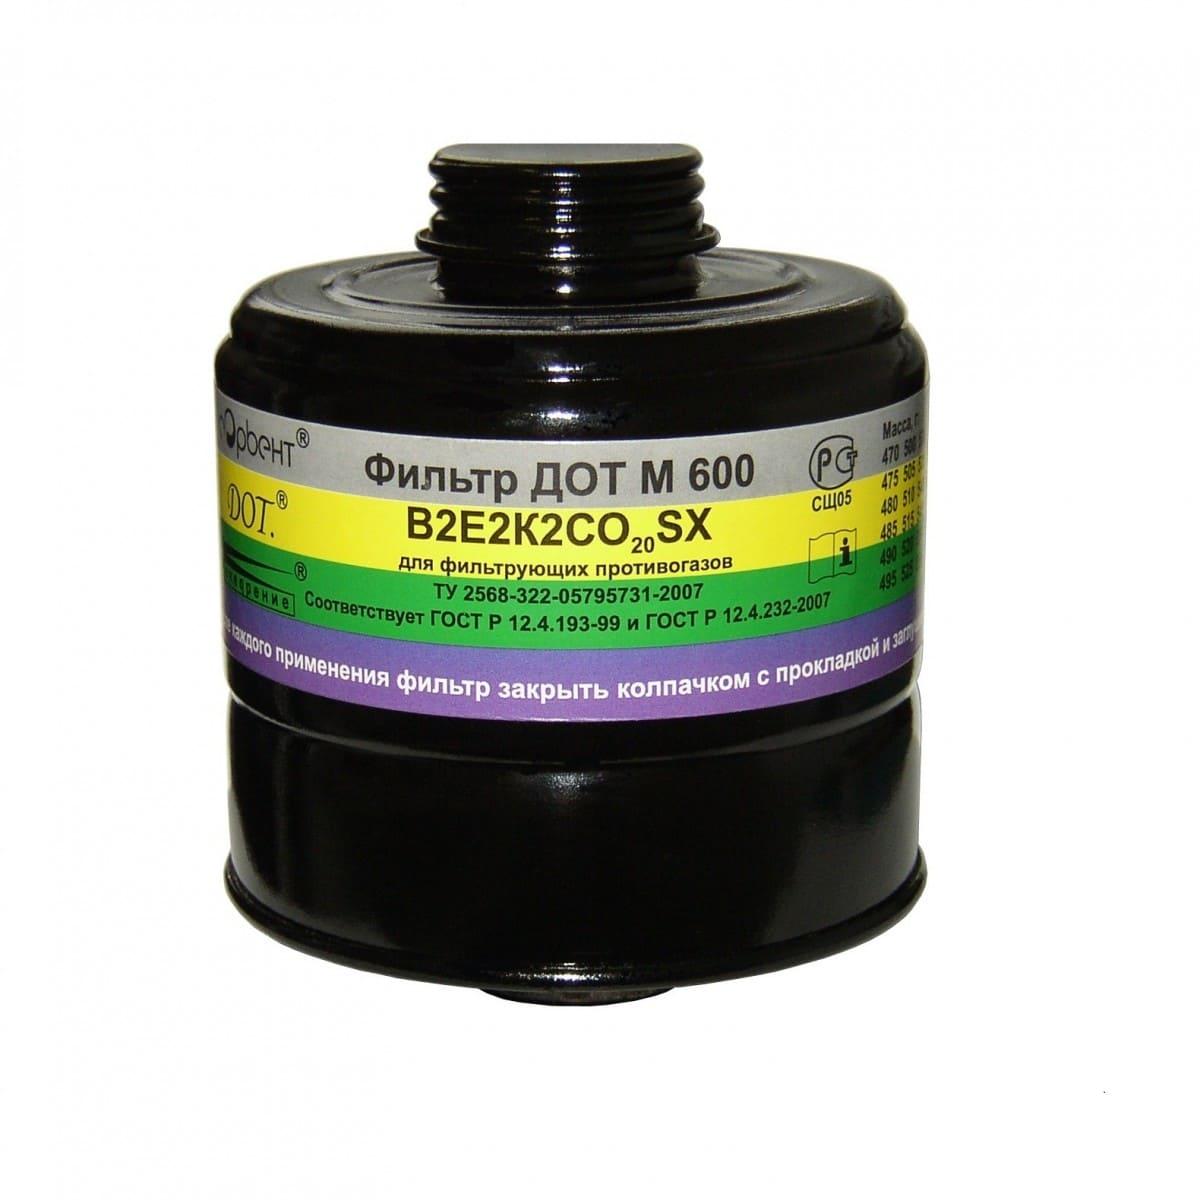 Фильтр ДОТ М 600 B2E2K2CO20SX